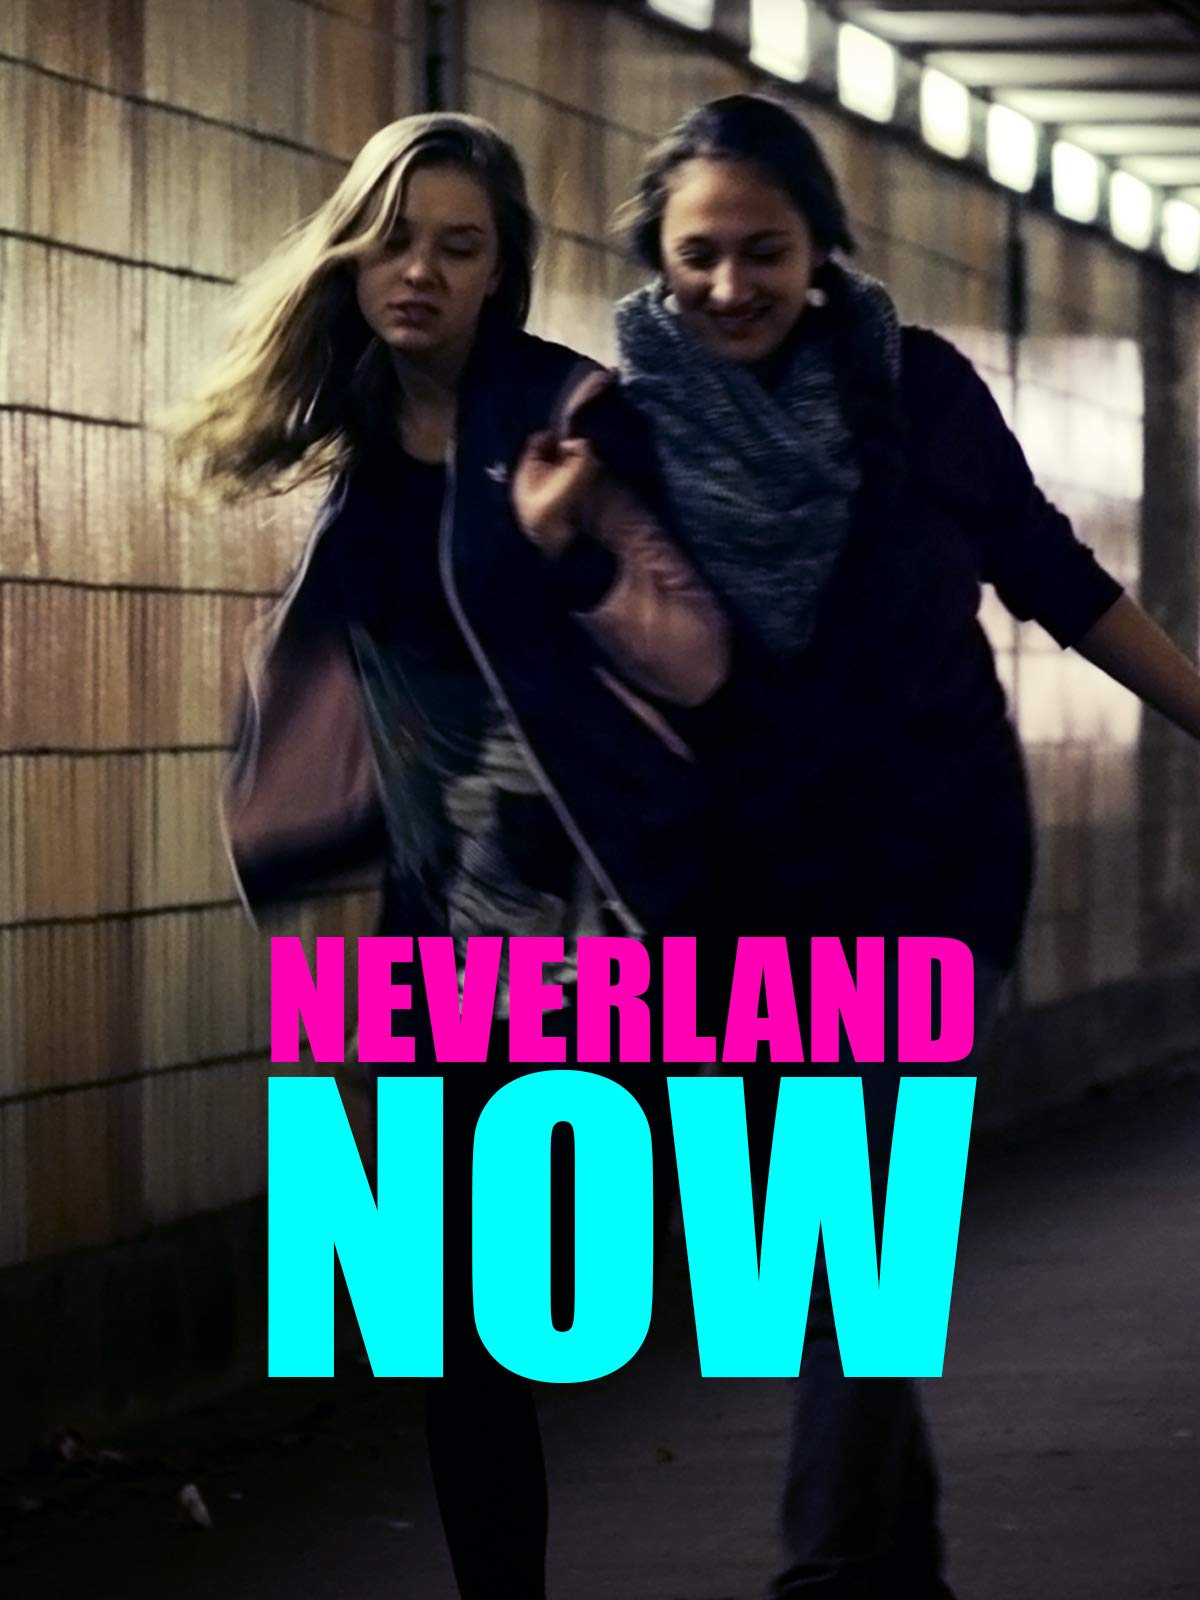 Neverland Now on Amazon Prime Video UK